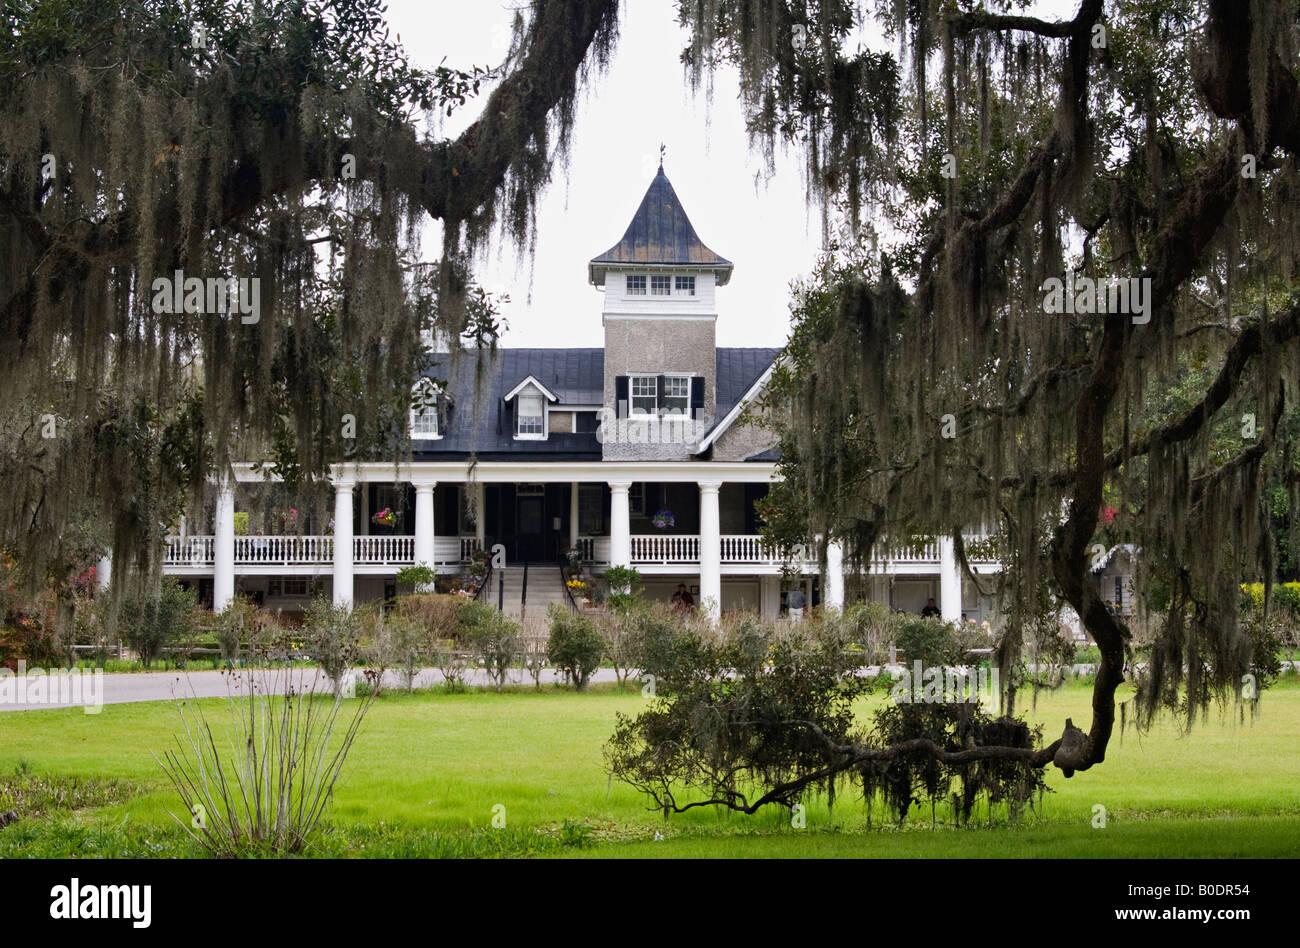 Plantation House Seen Through Live Oak And Spanish Moss At Magnolia